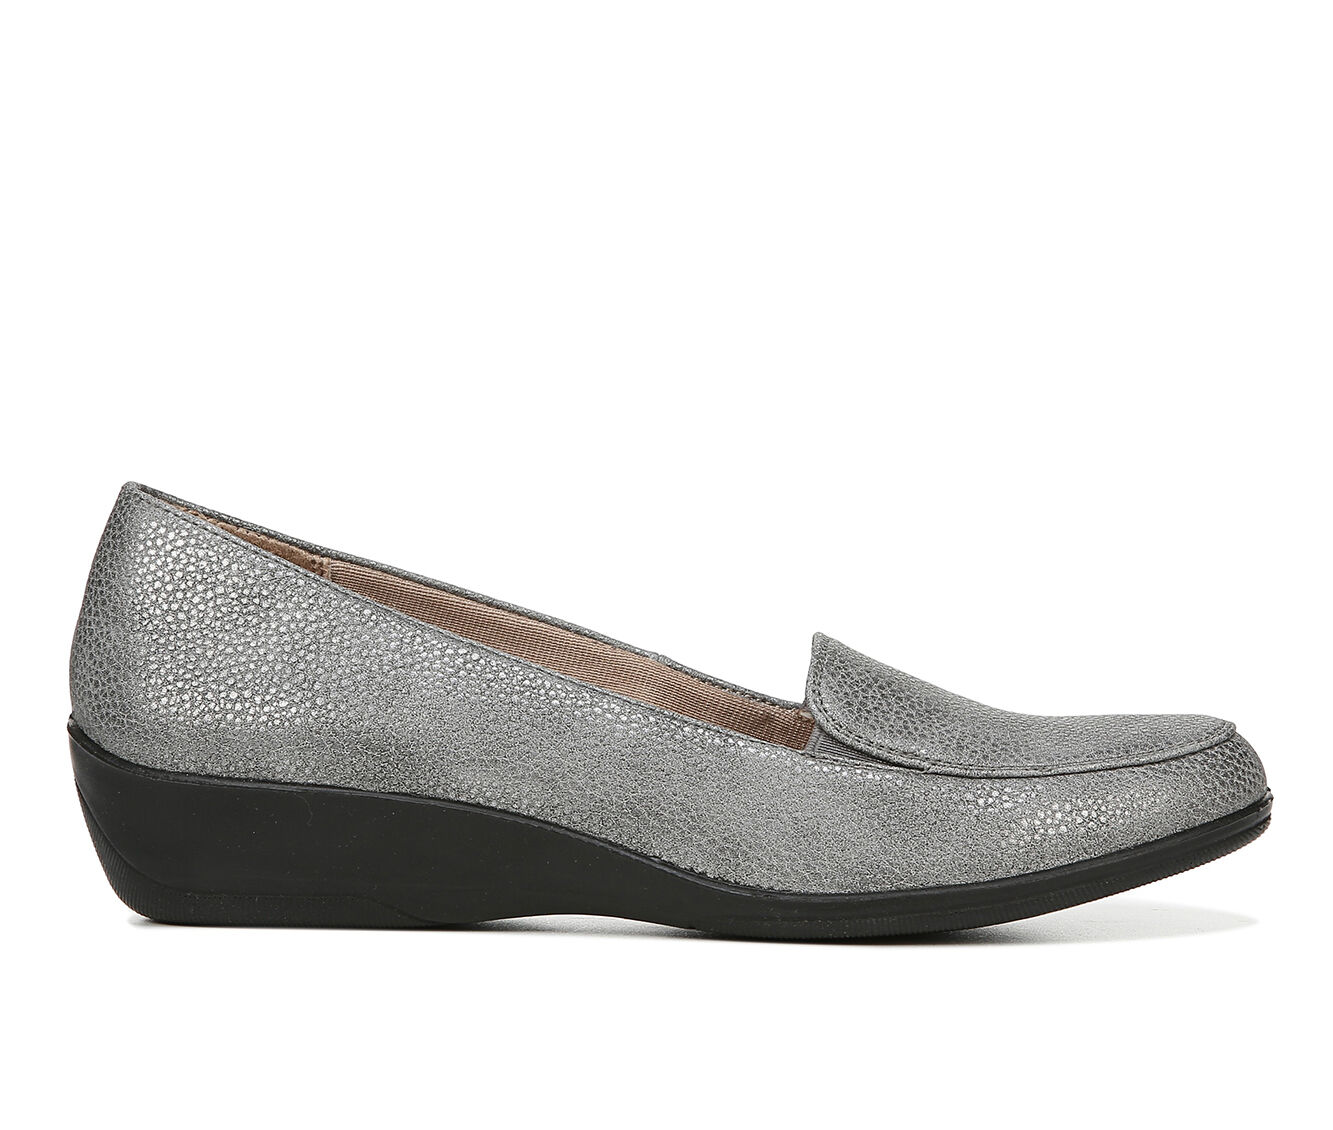 Women's LifeStride Impulse Shoes Pewter